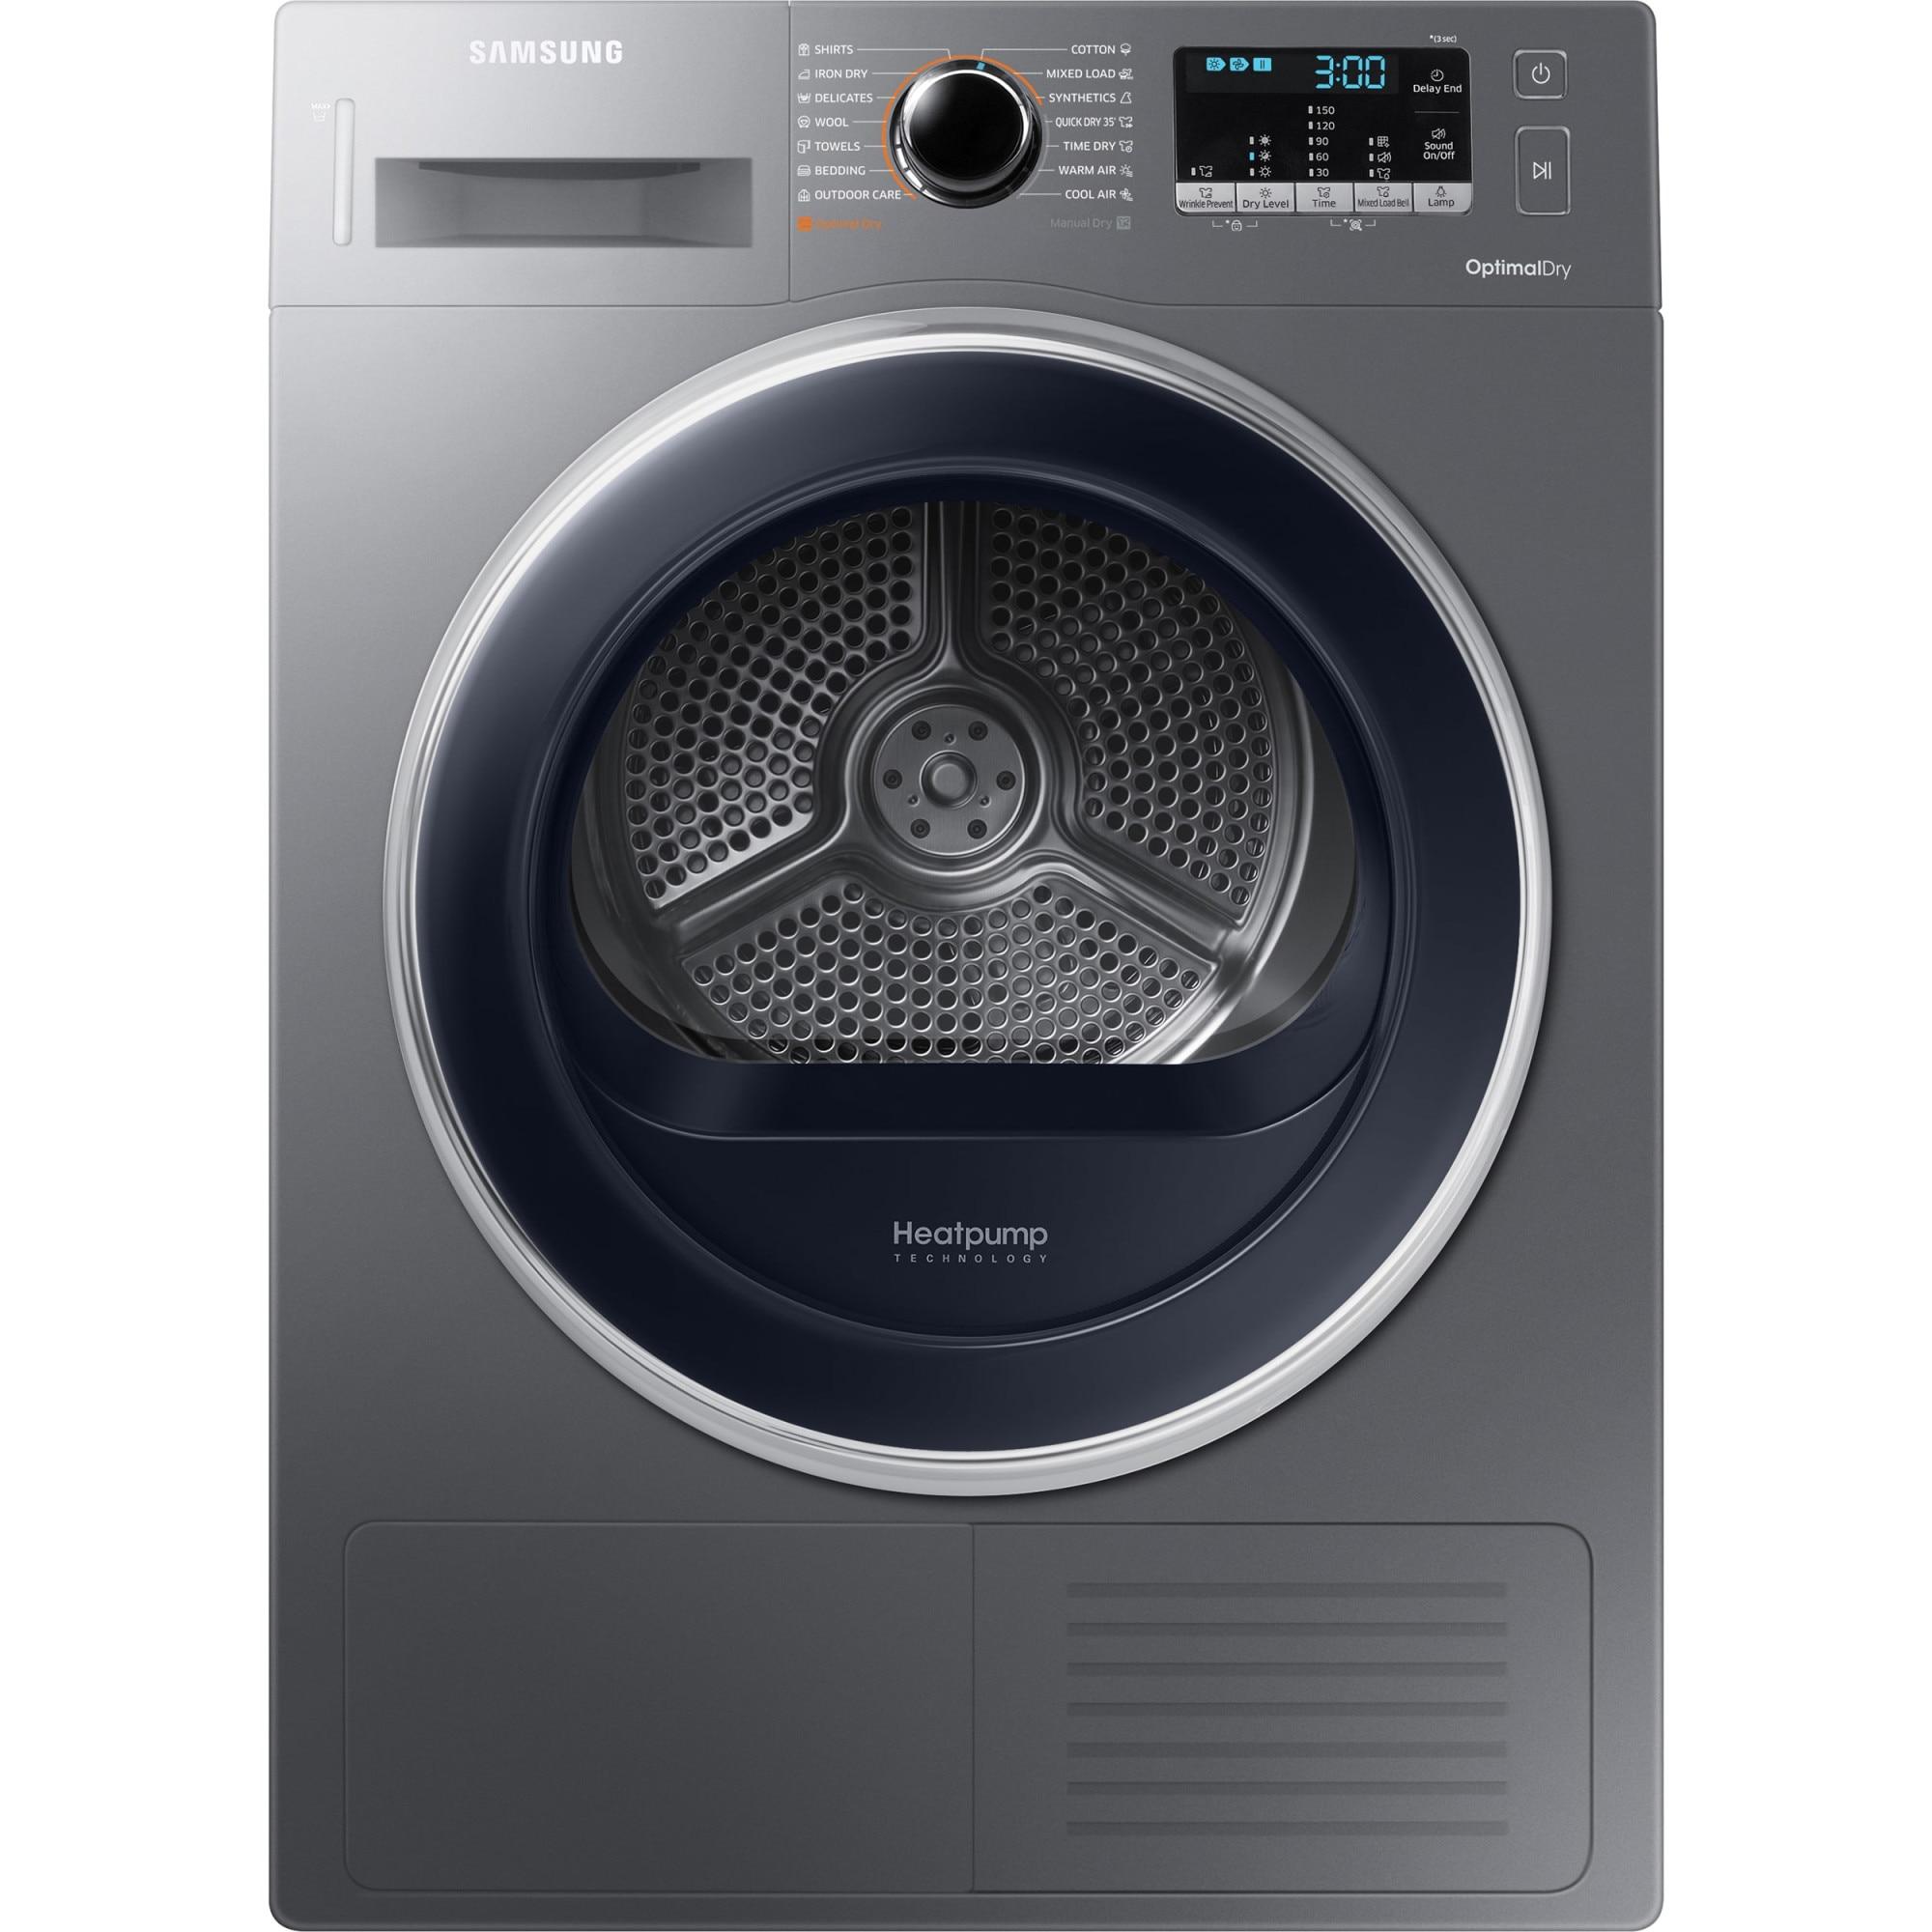 Fotografie Uscator de rufe Samsung DV90M5010QX/LE, Pompa de caldura, 9 kg, 18 programe, Clasa A++, Smart Check, Inox